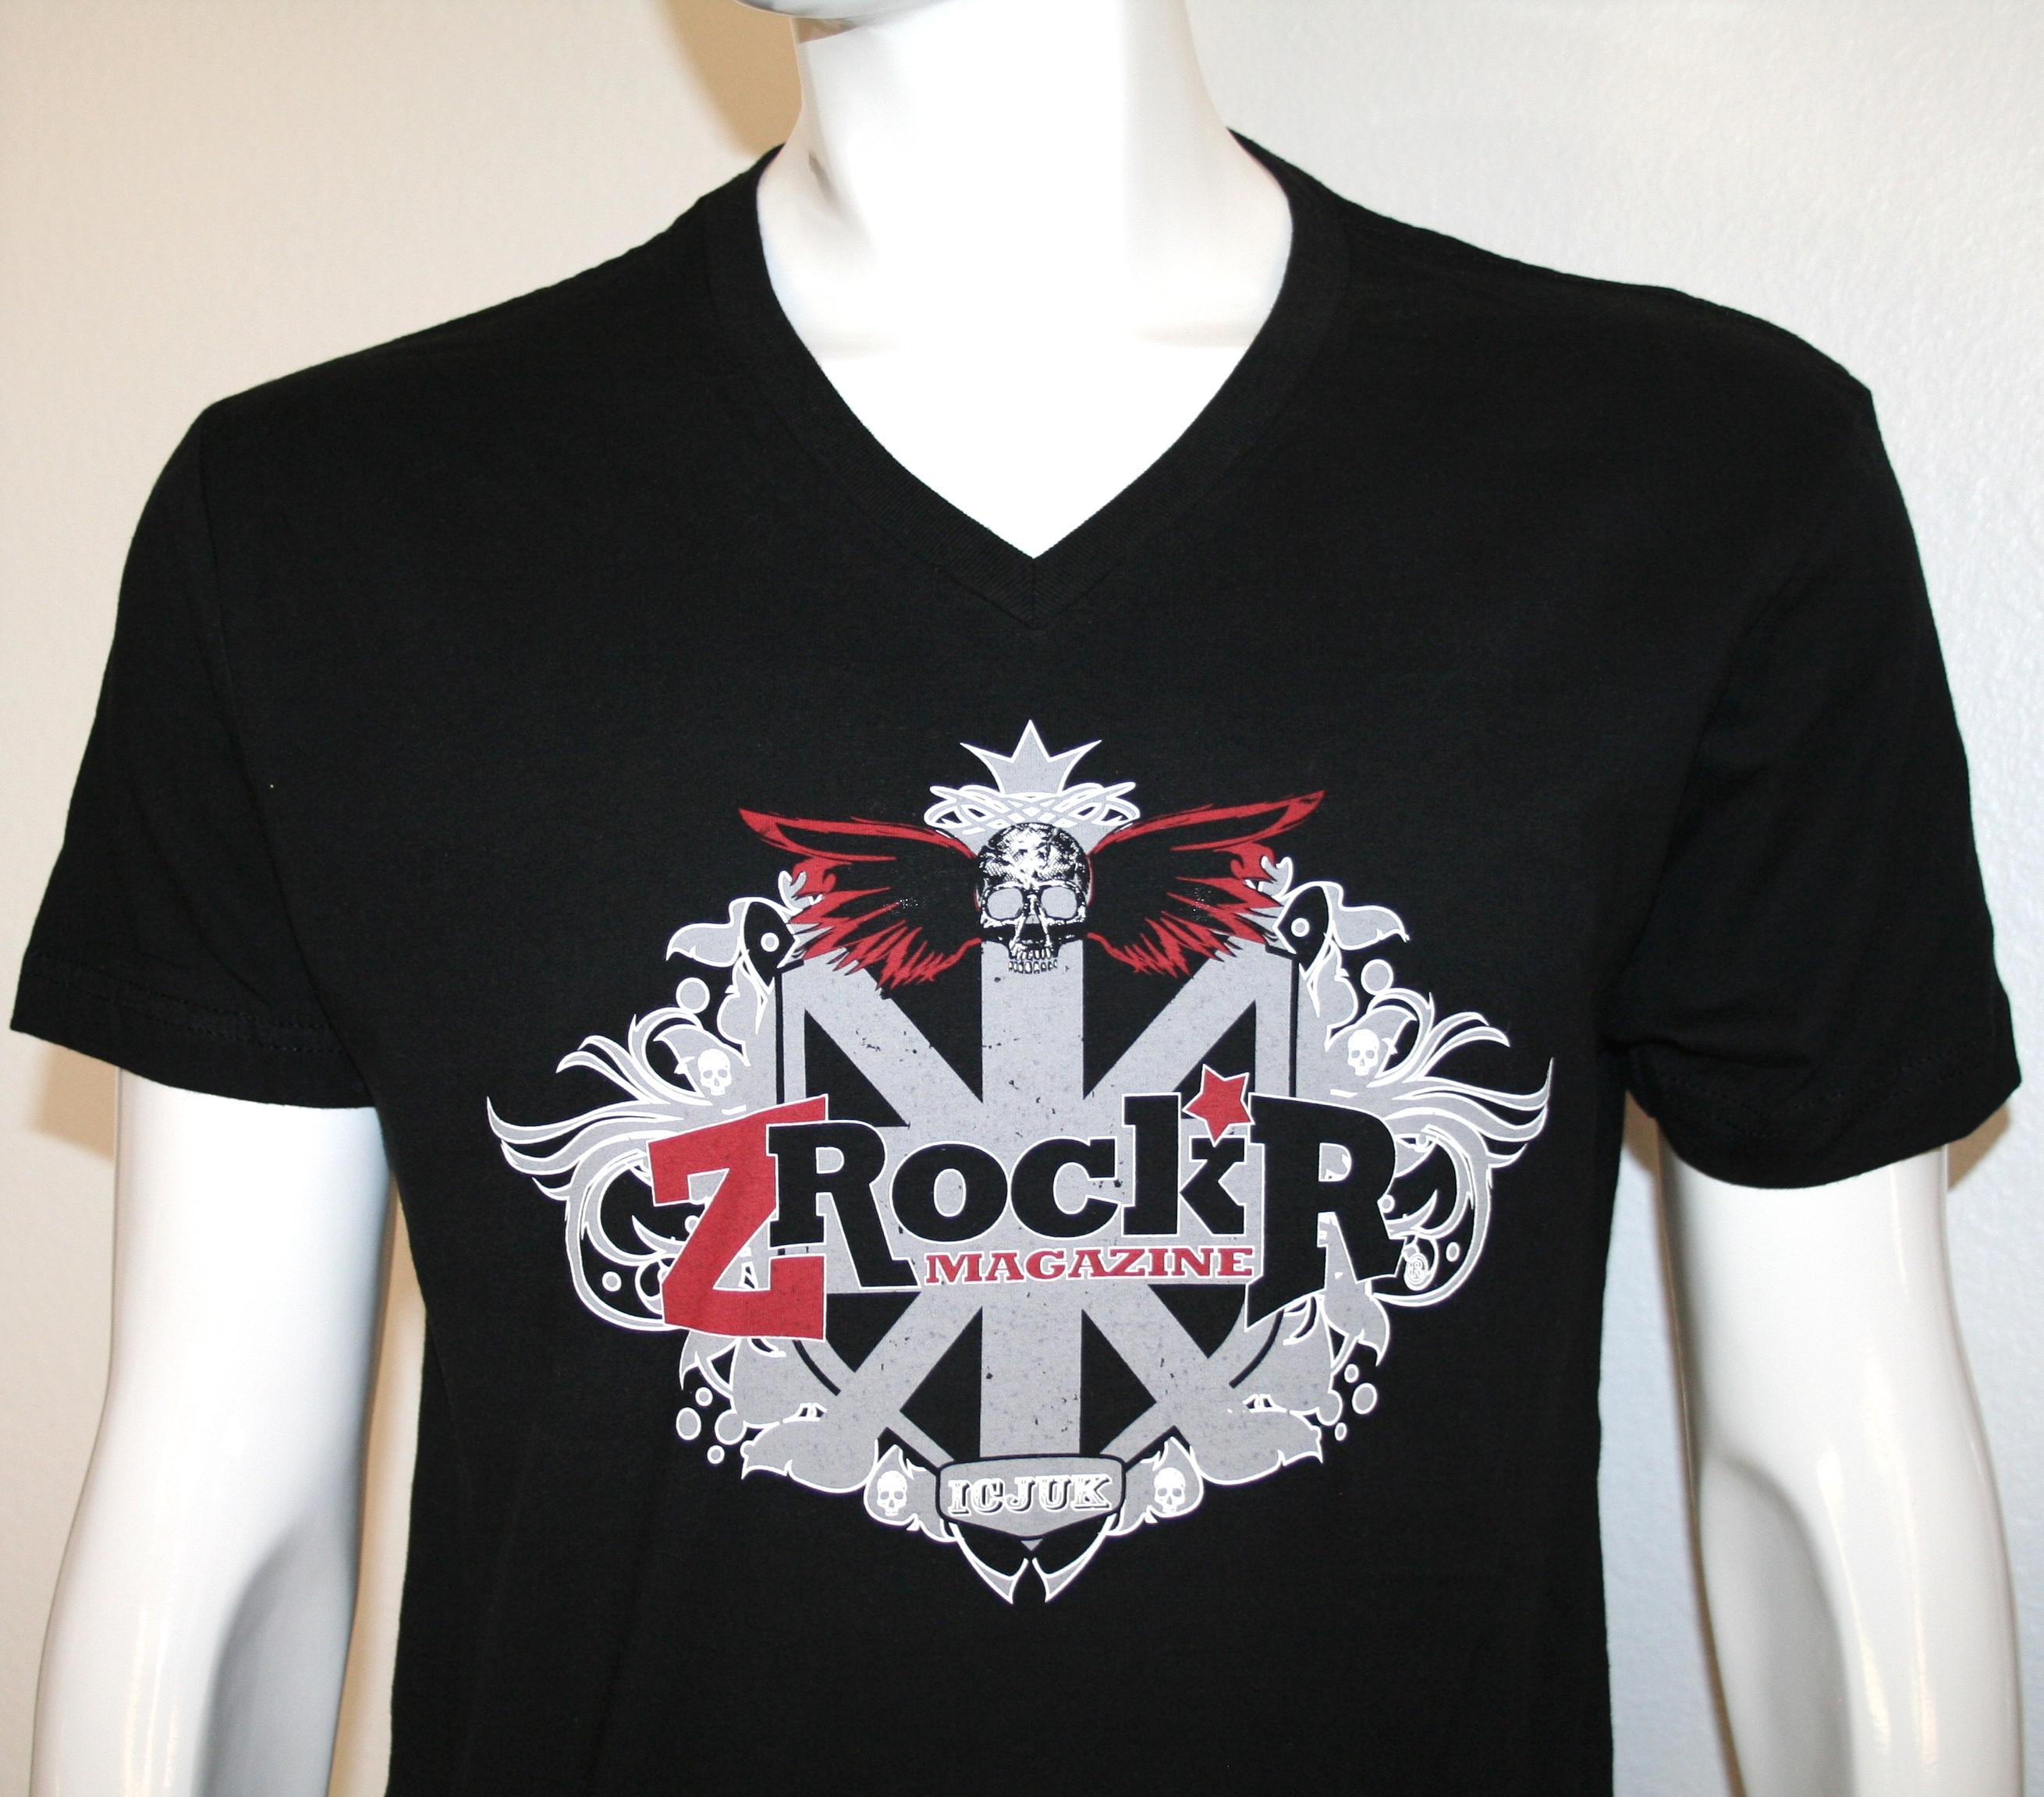 ZRockr magazine tee shirt design